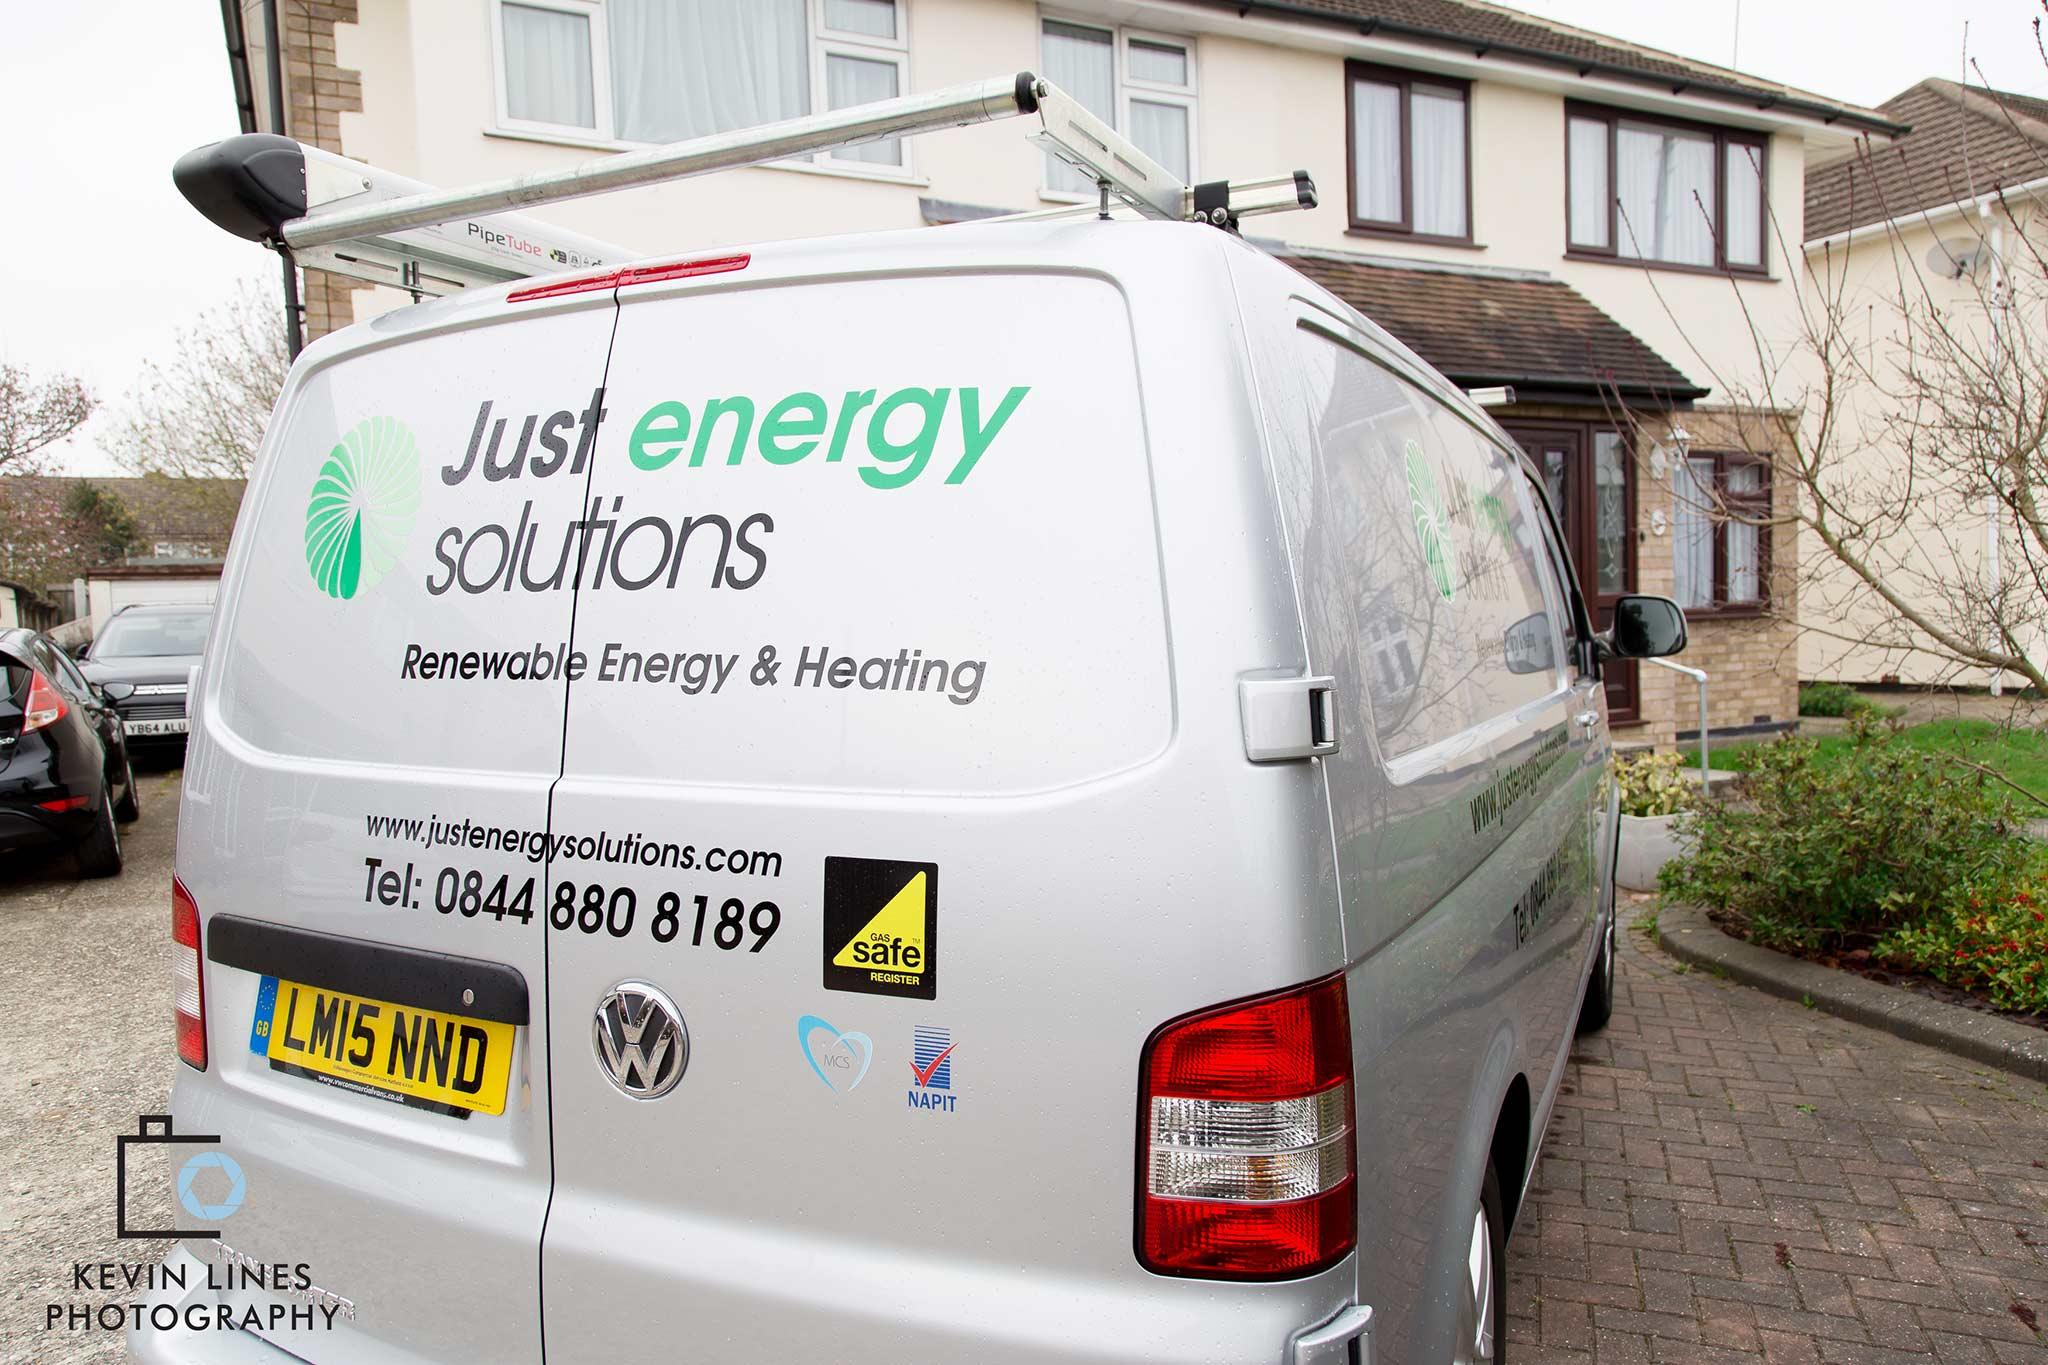 just-energy-solutions-4.jpg